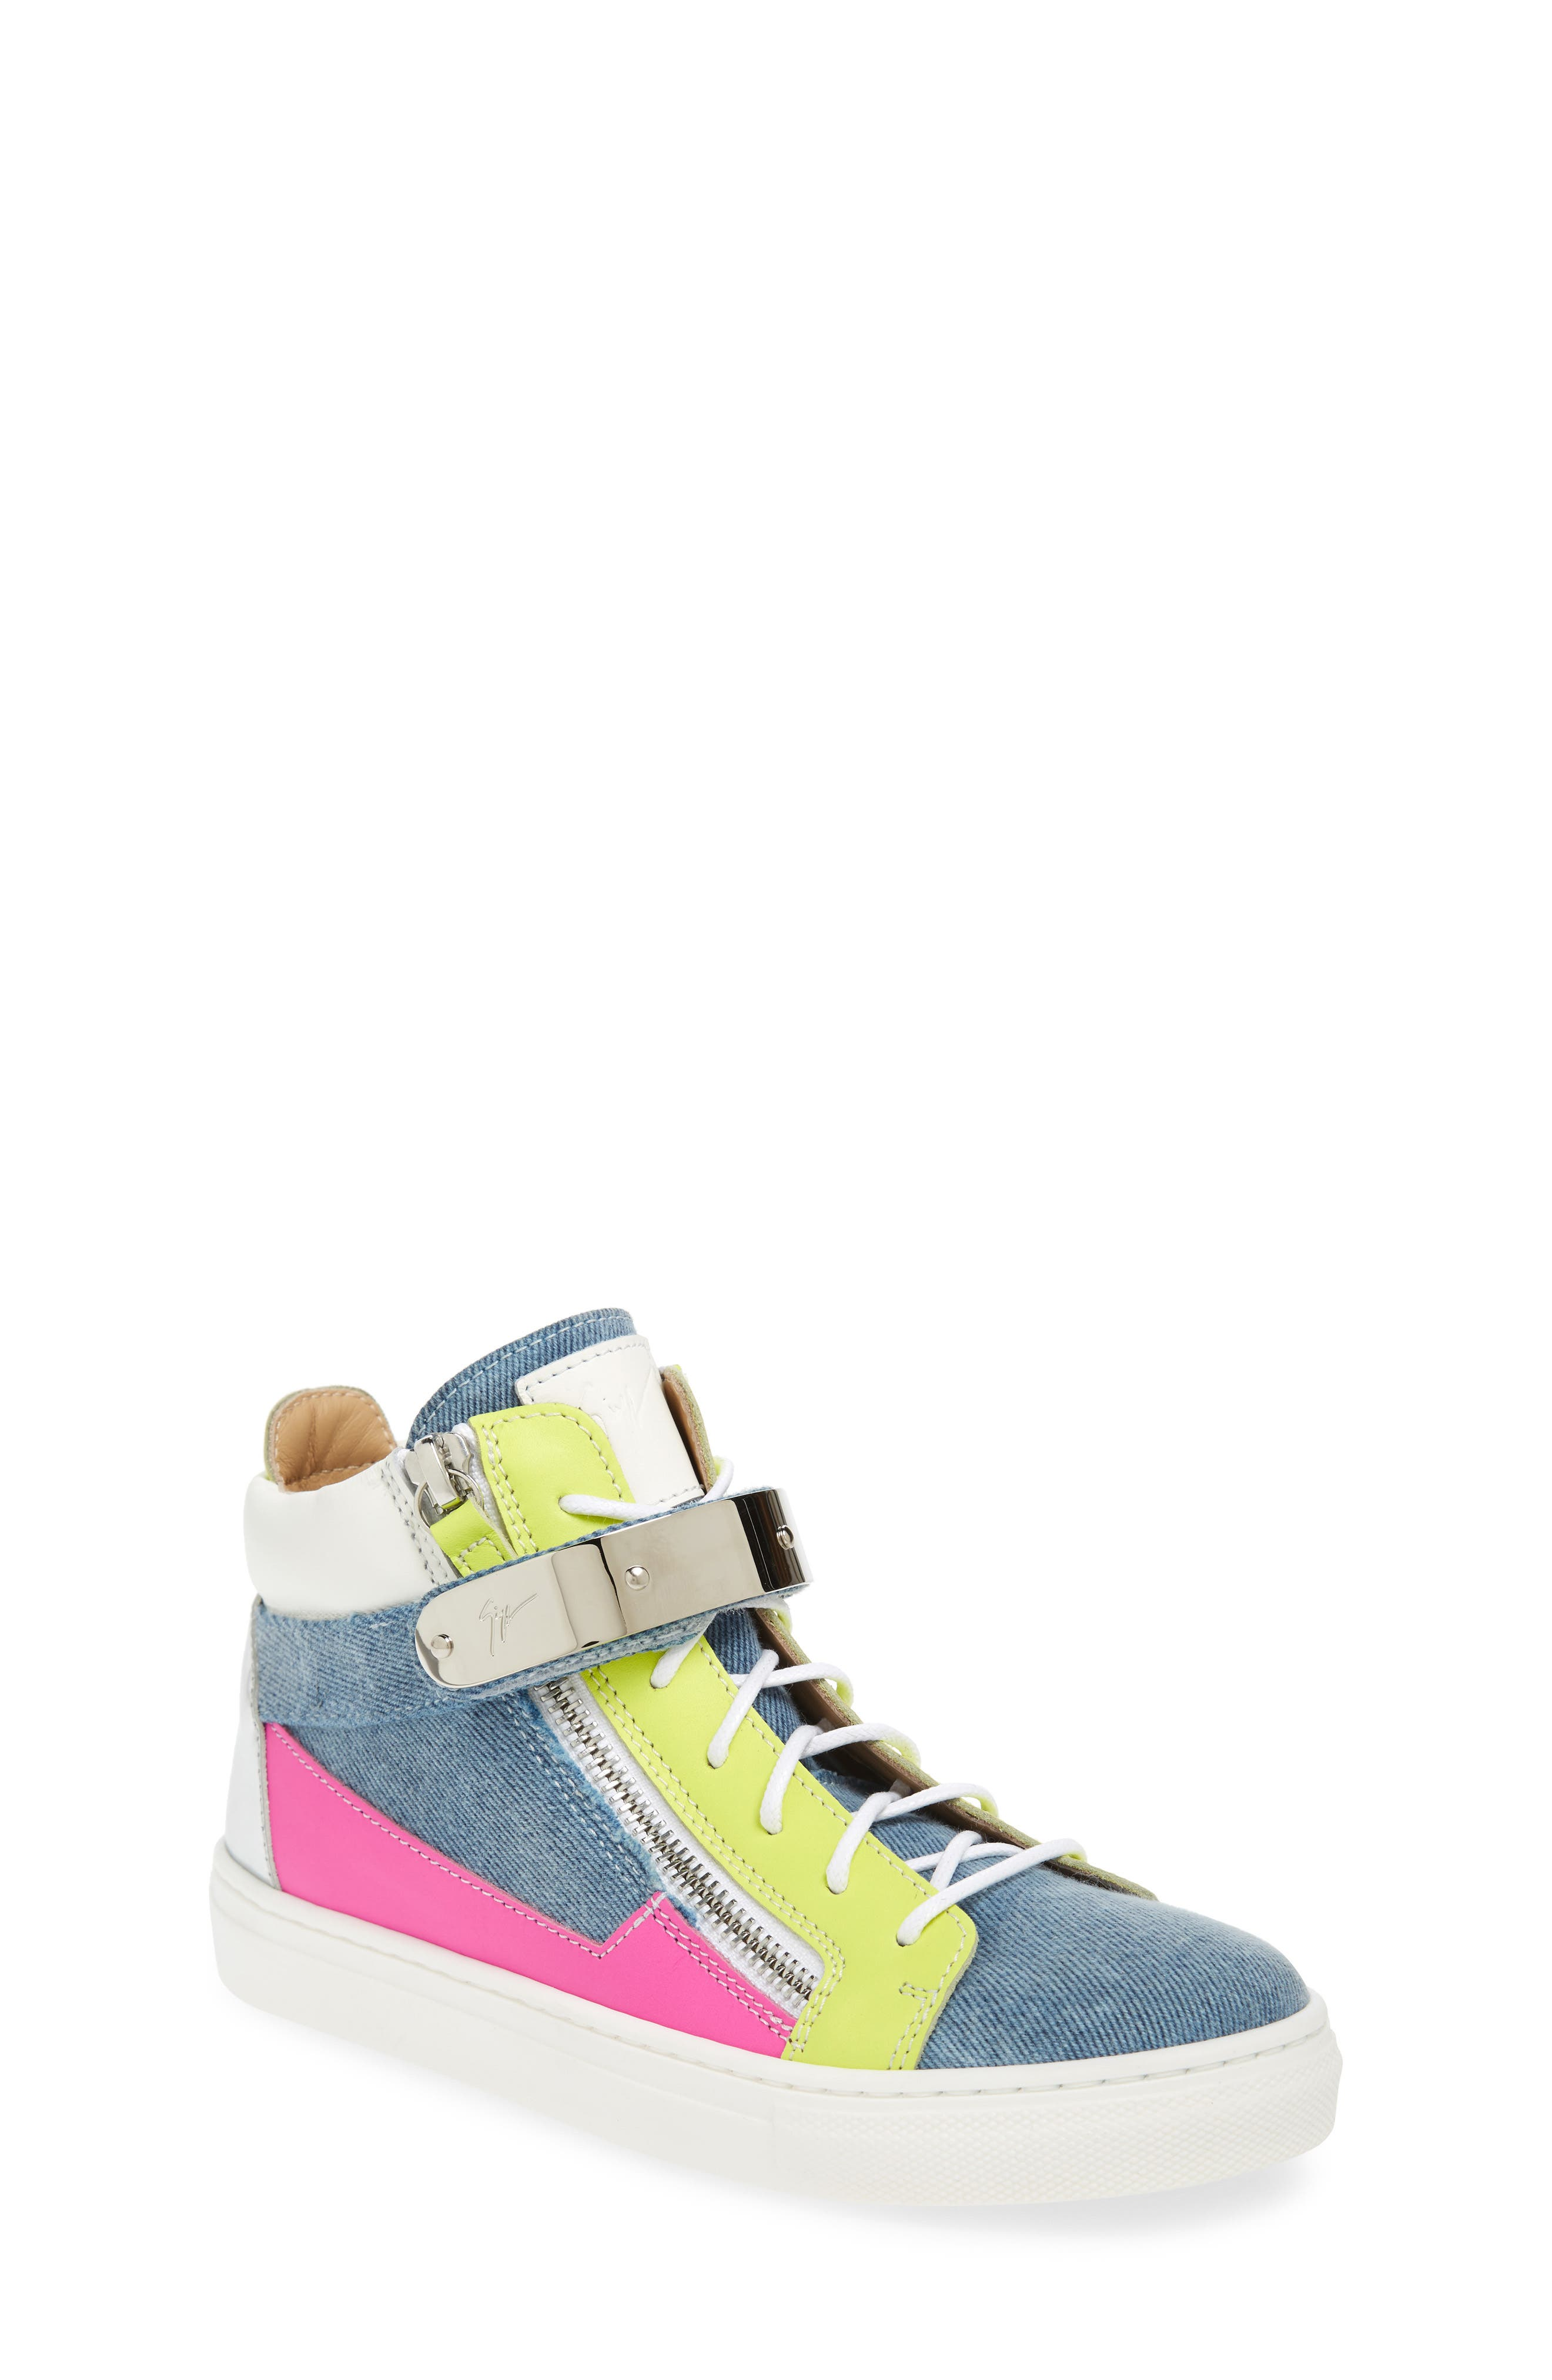 London High Top Sneaker,                             Main thumbnail 1, color,                             400